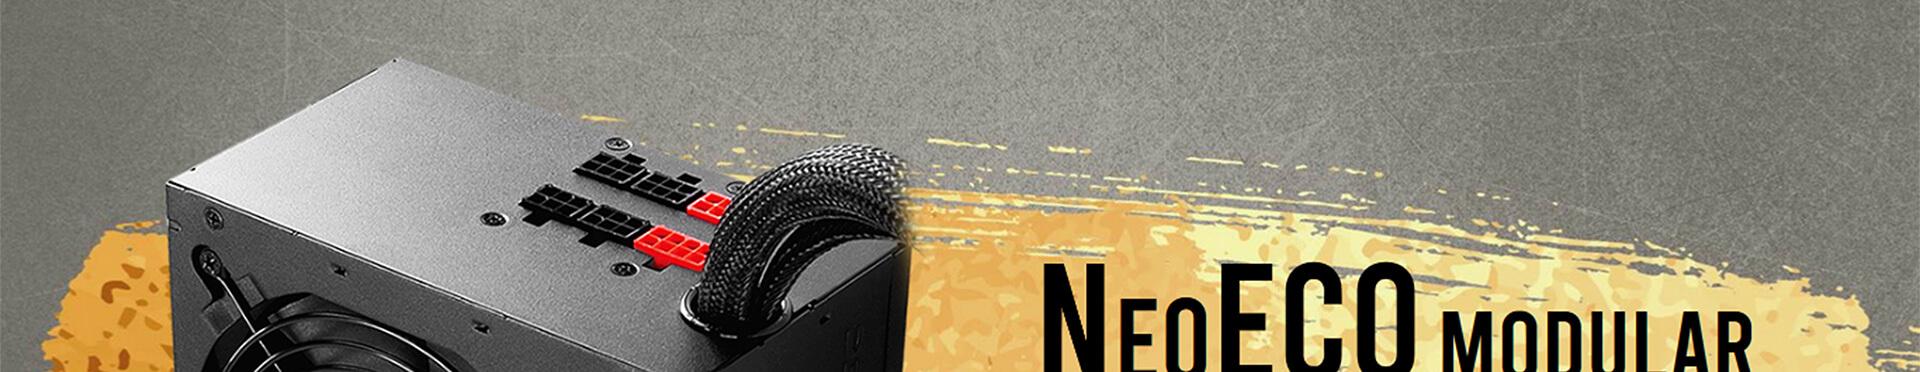 NeoECO-Modular-650-V2---antec_01.jpg